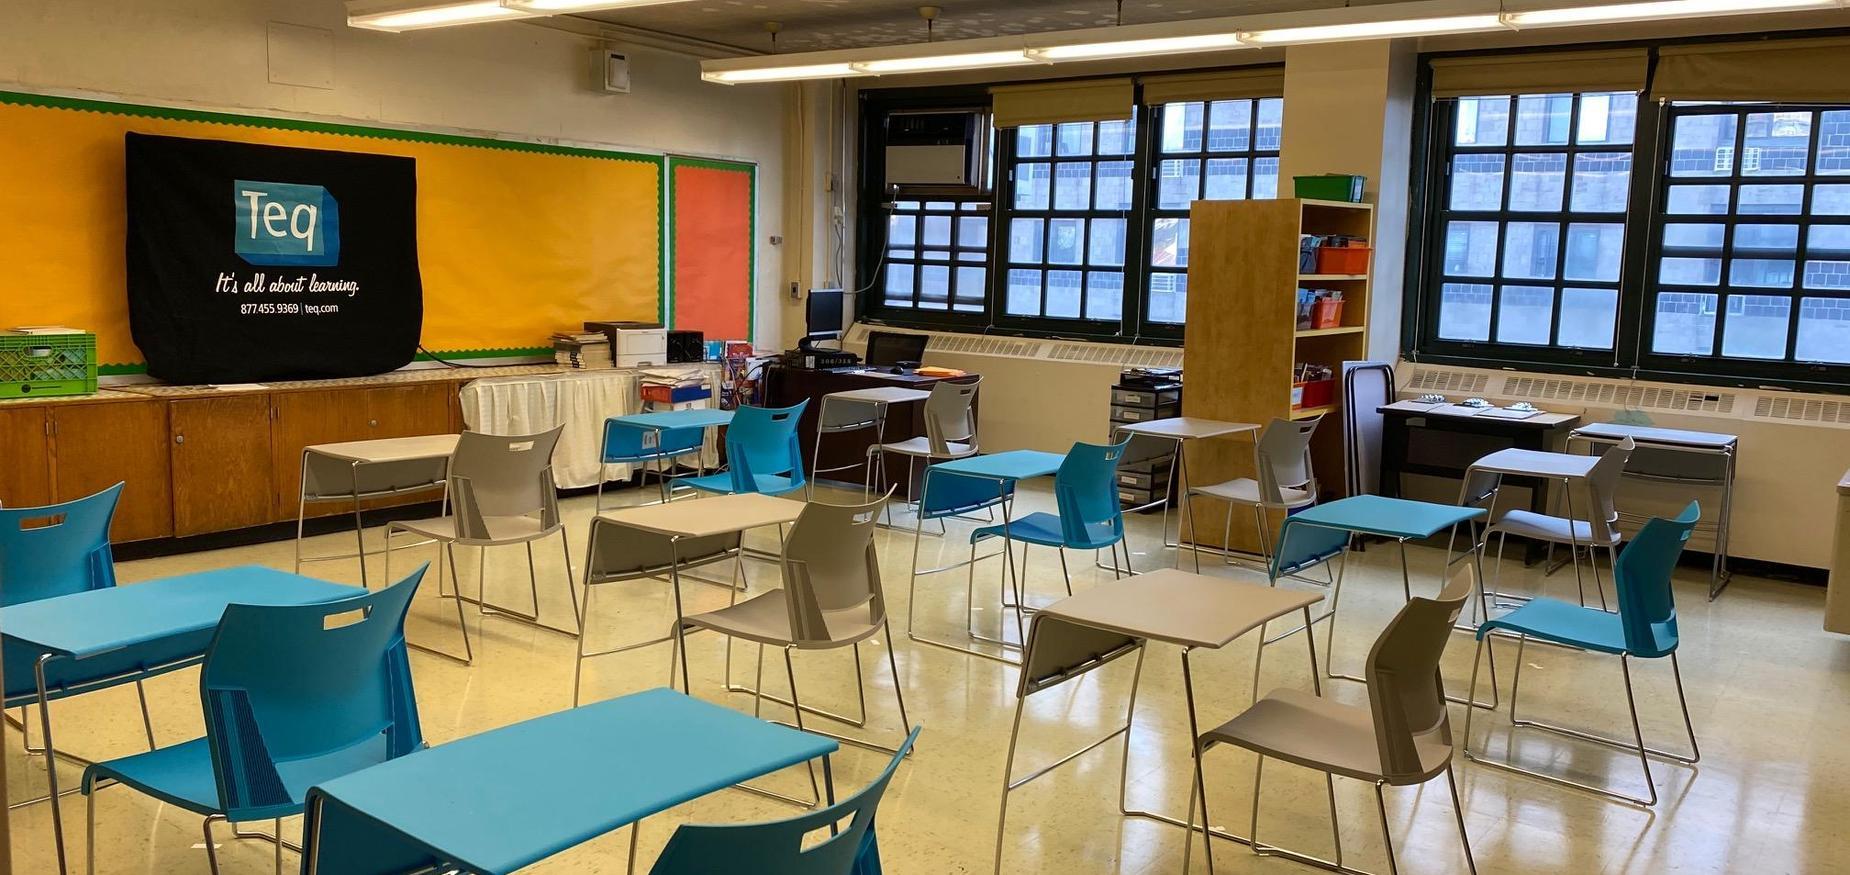 8th grade classroom